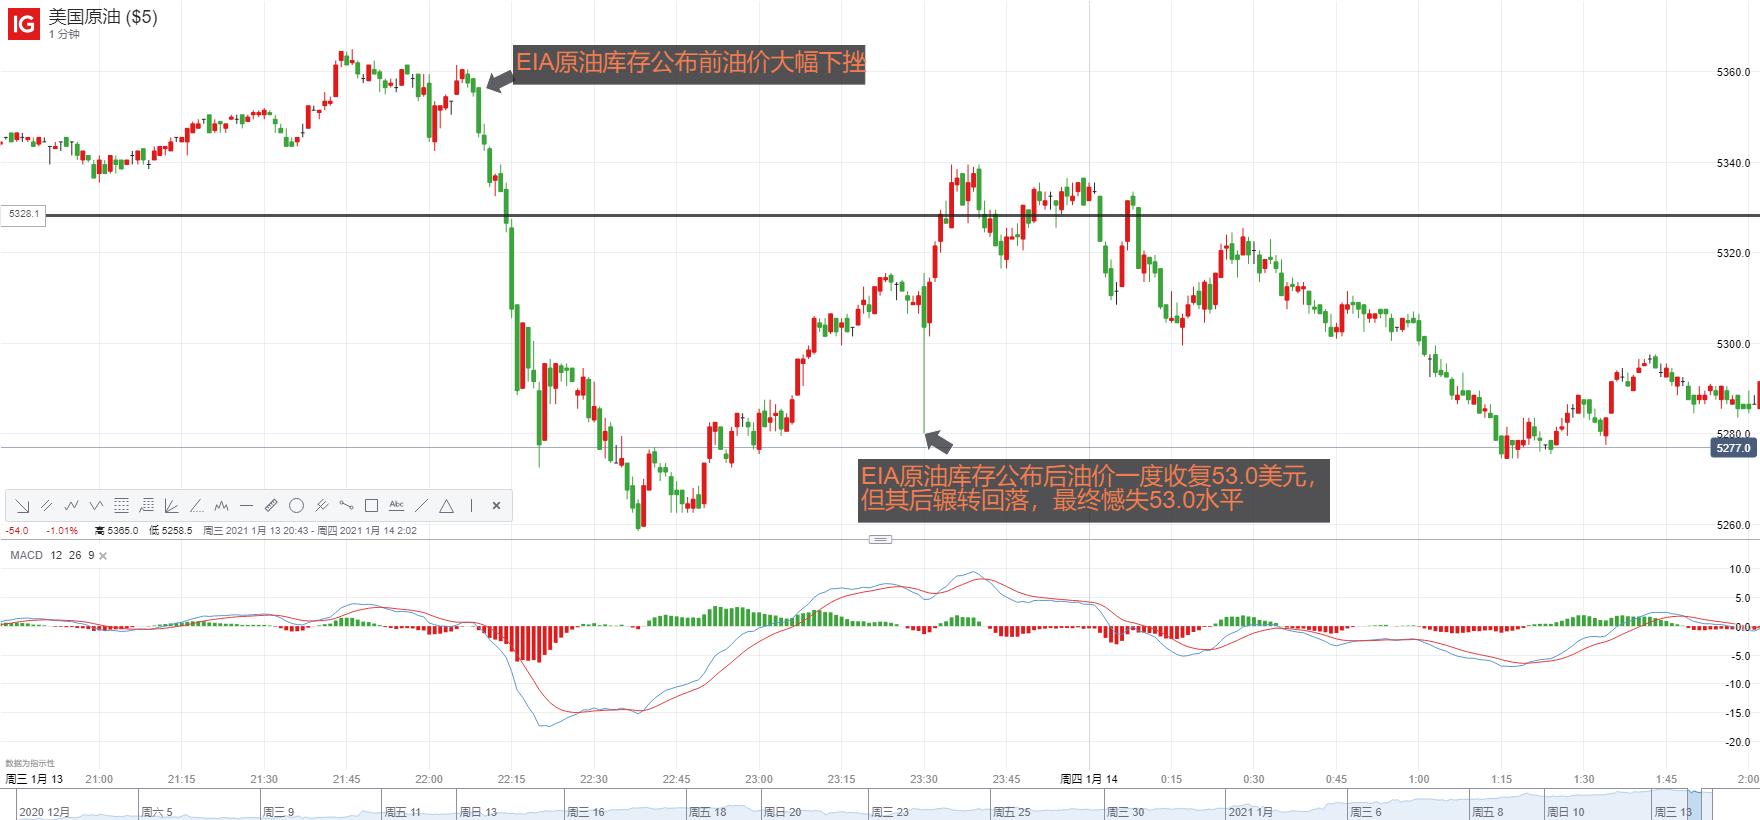 WTI原油走勢分析:多頭獲利了結?油價53美元得而復失,警惕後市回調幅度進一步加大!